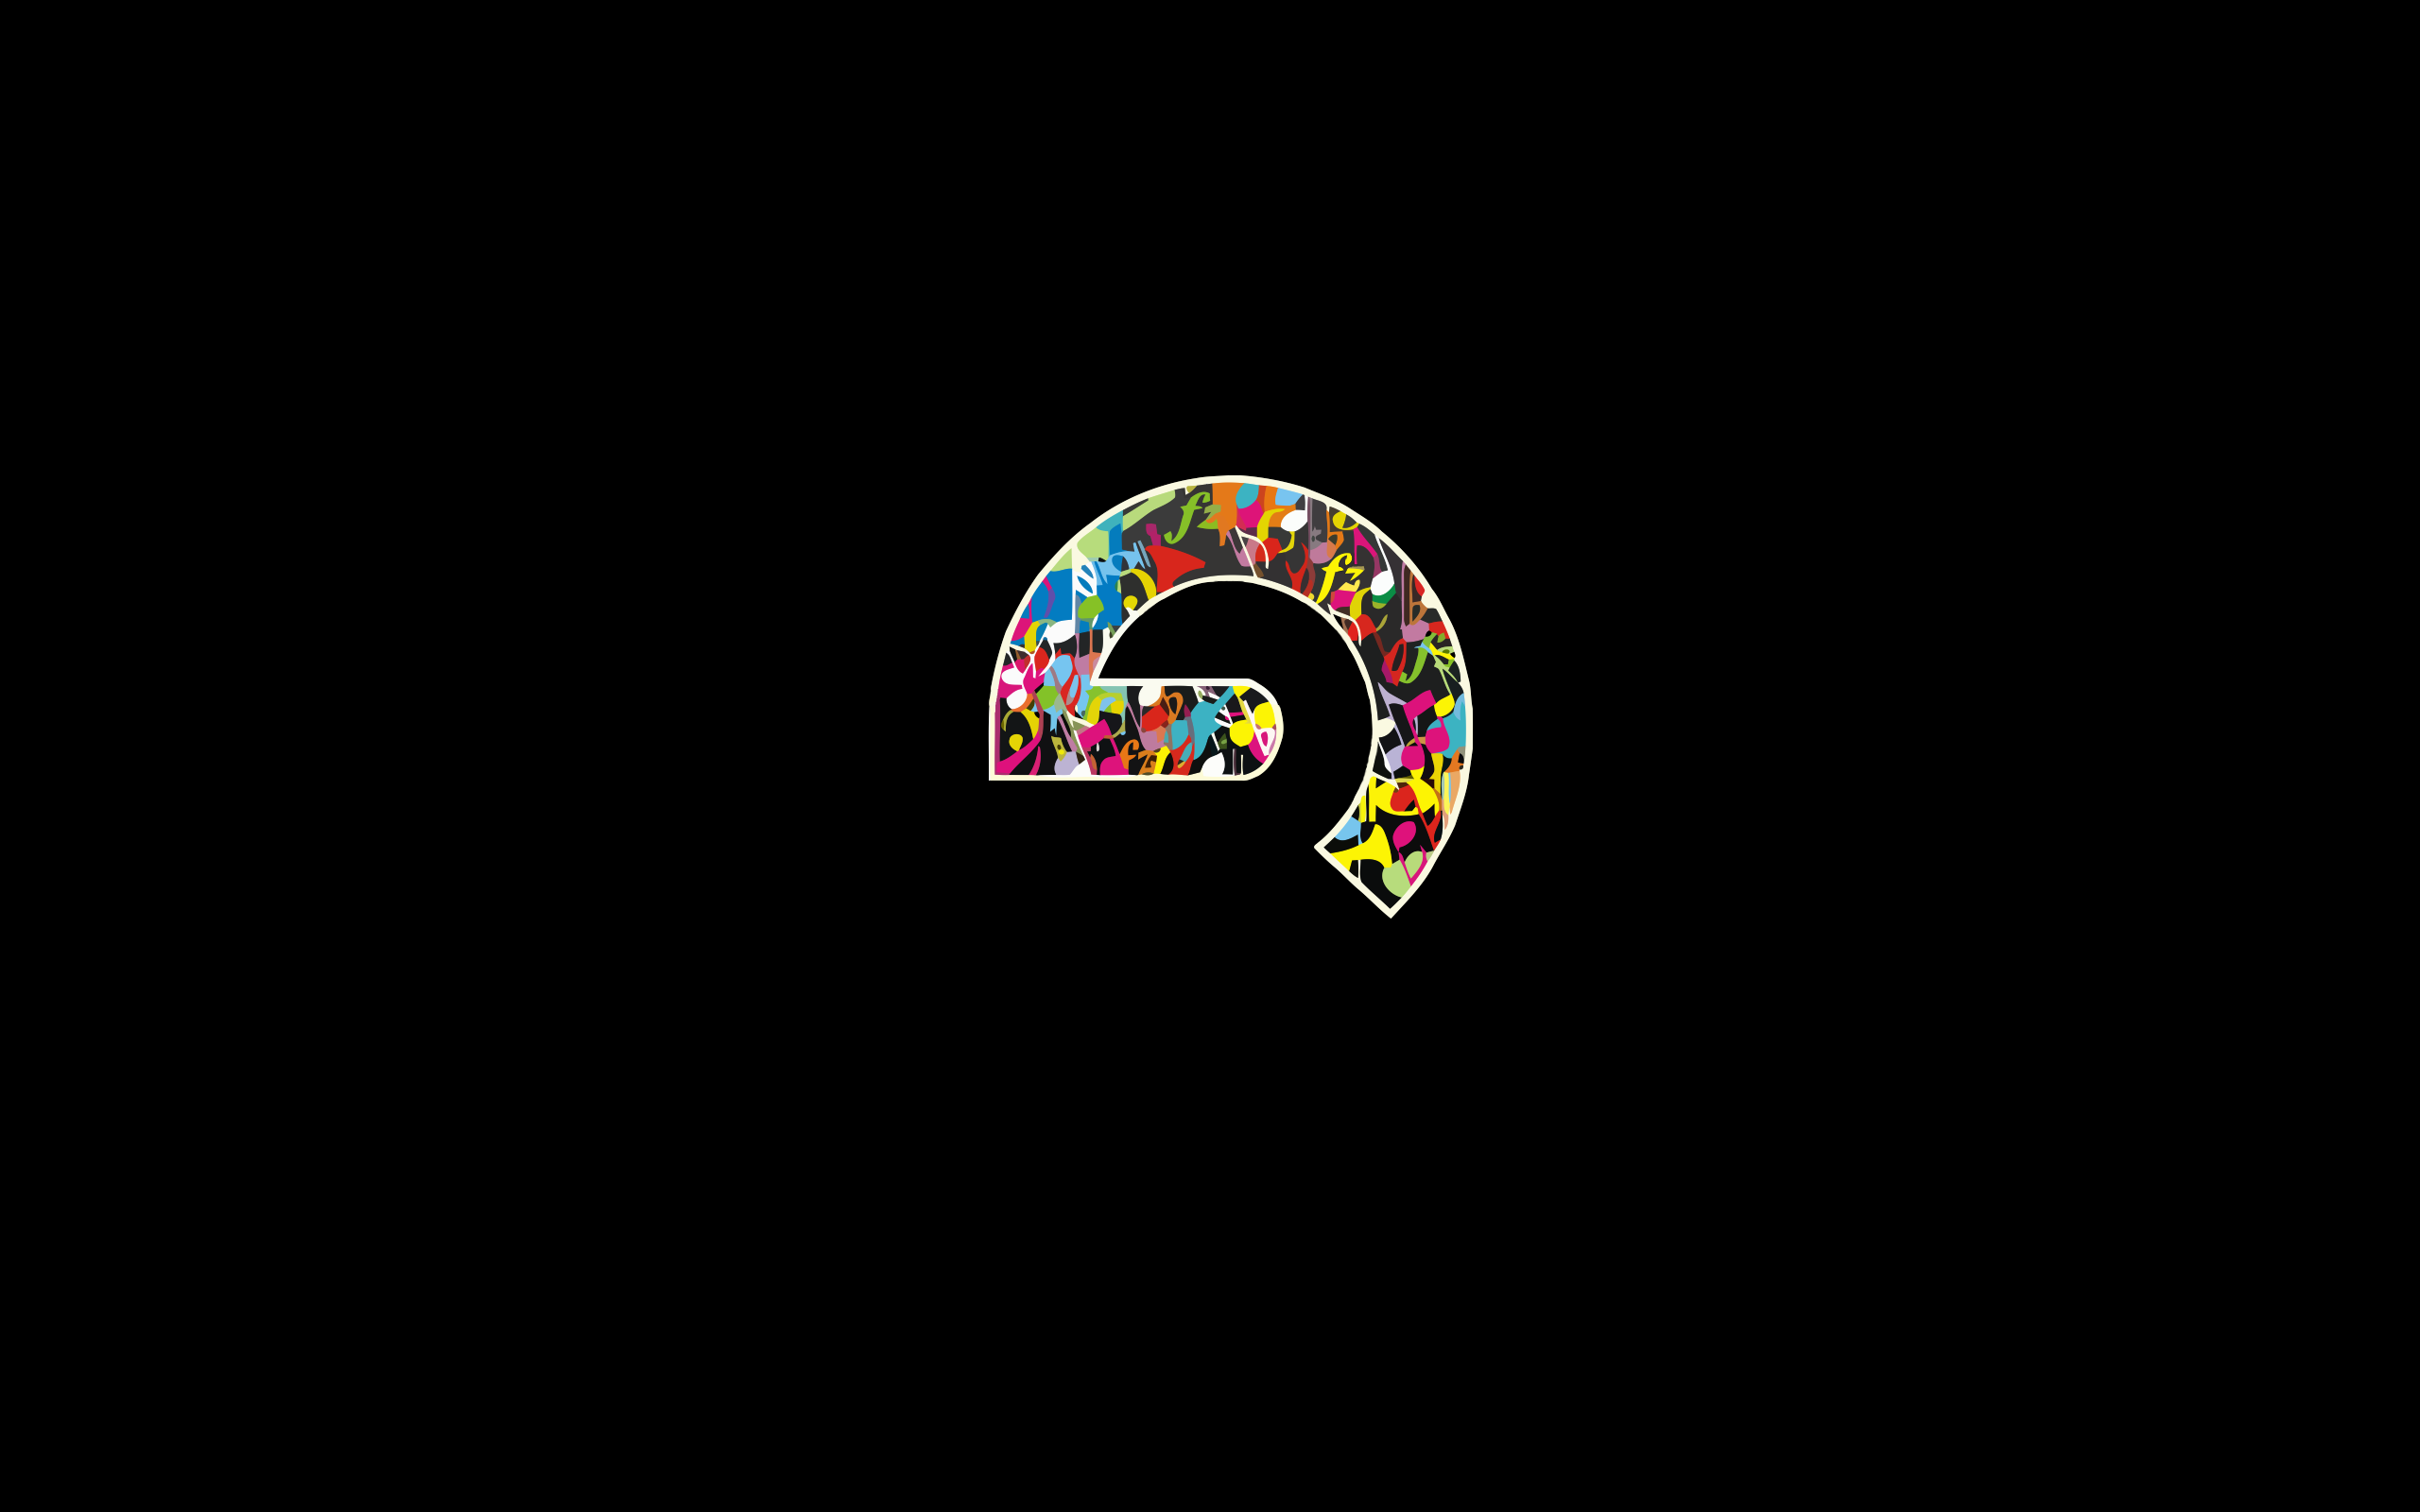 Ableton Live Logo Ableton logopng 2560x1600